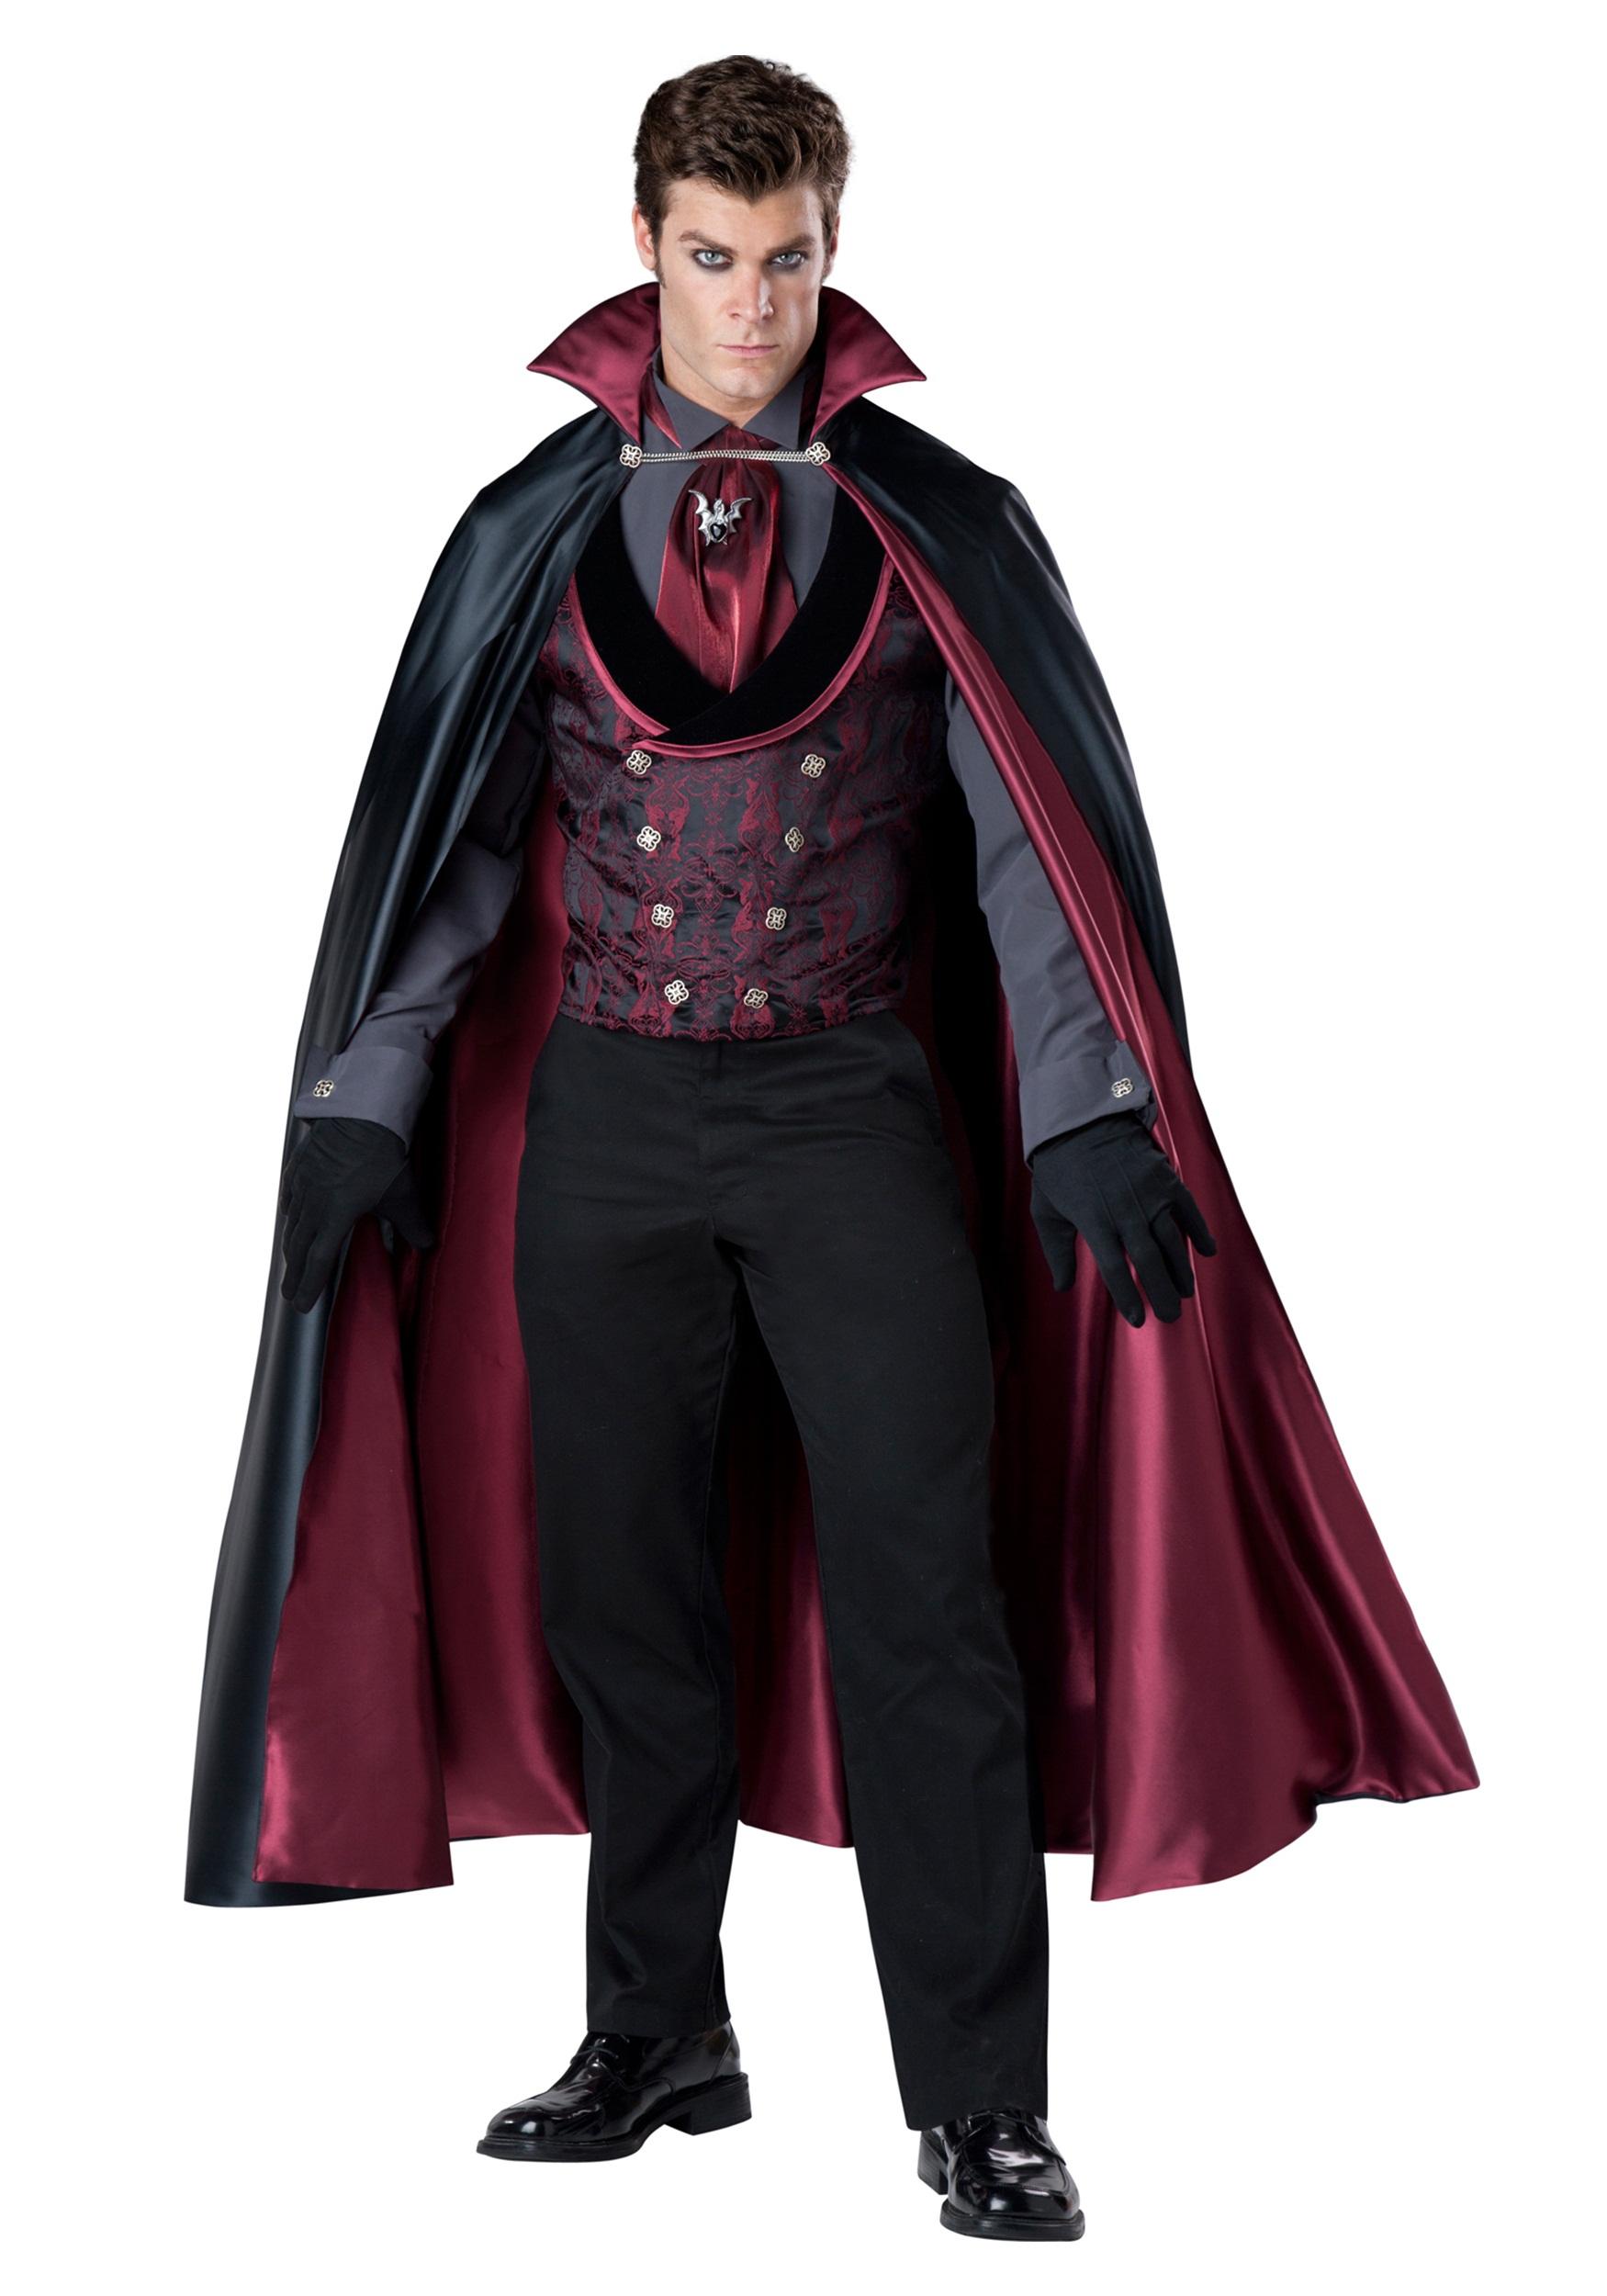 Sexy Male Vampire Costume : vampire, costume, Nocturnal, Count, Vampire, Costume